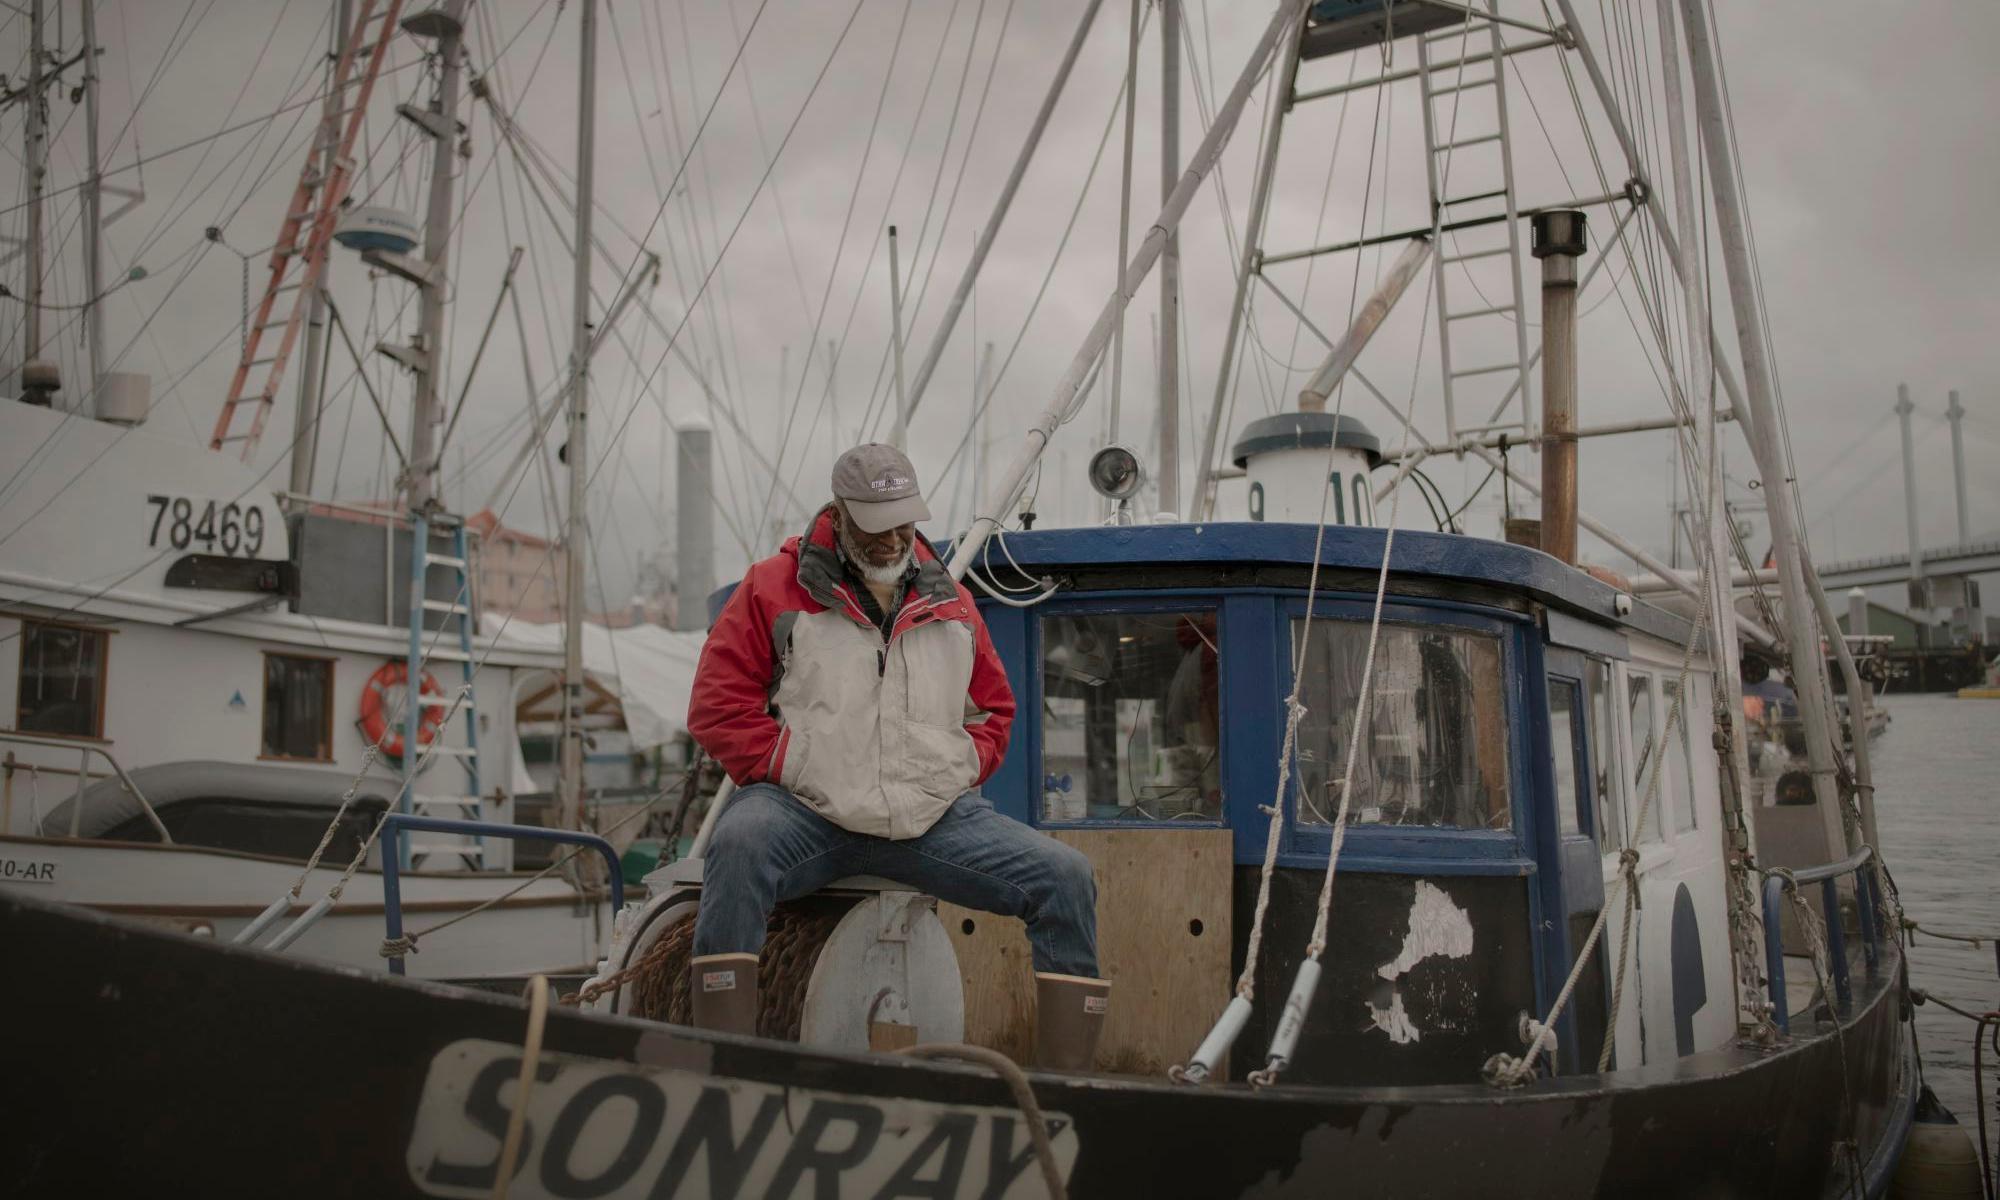 The Sitka tribe's struggle to save Alaskan herring – photo essay